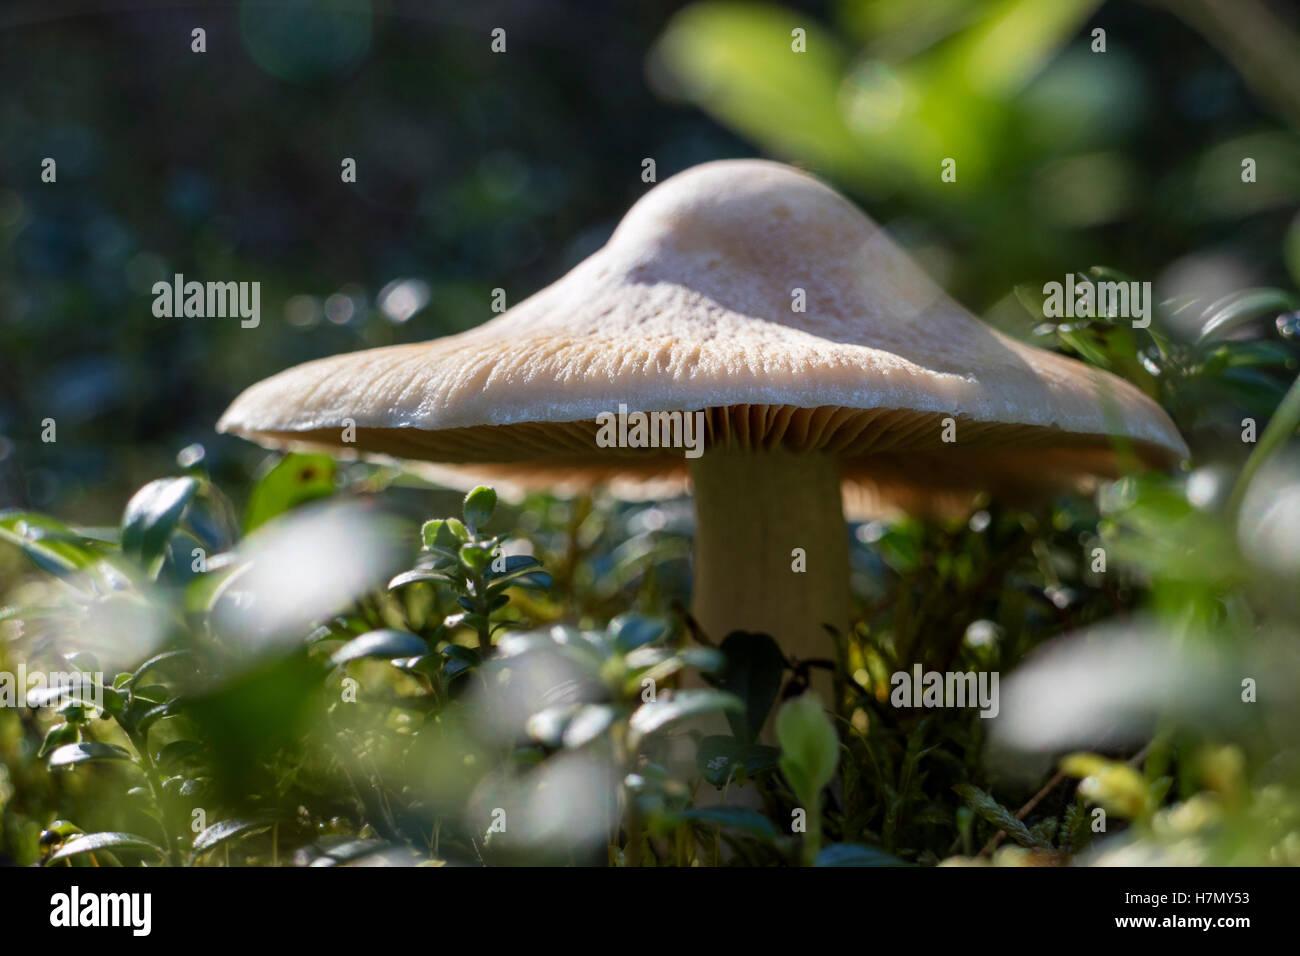 Cortinarius mushroom in the forest - Stock Image